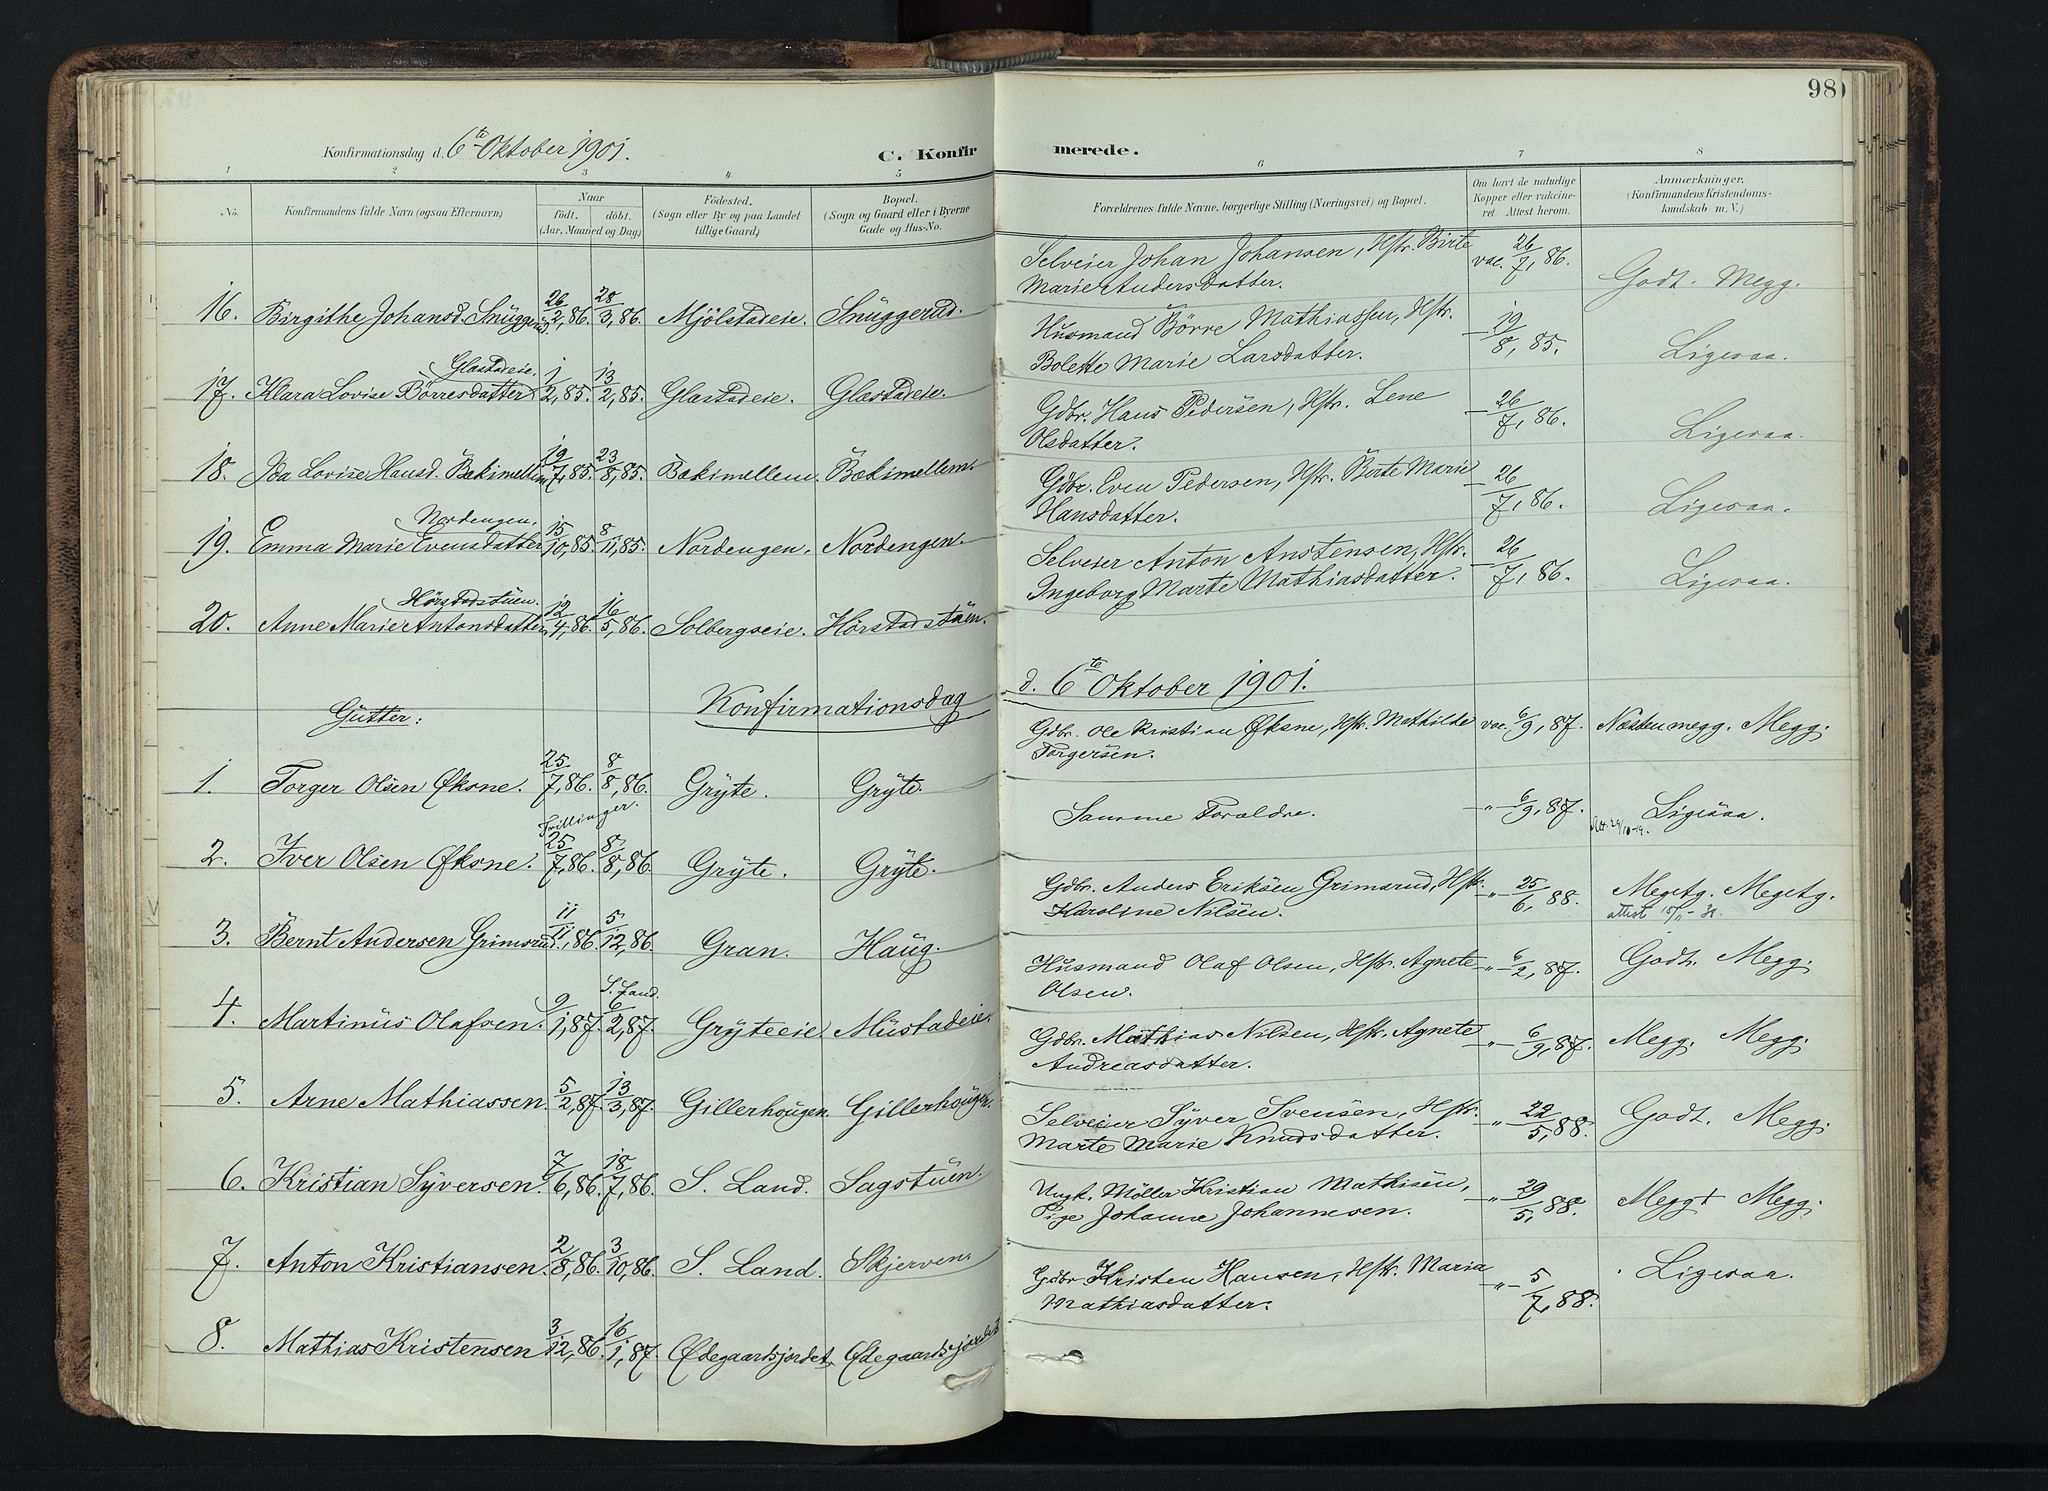 SAH, Vardal prestekontor, H/Ha/Haa/L0019: Ministerialbok nr. 19, 1893-1907, s. 98